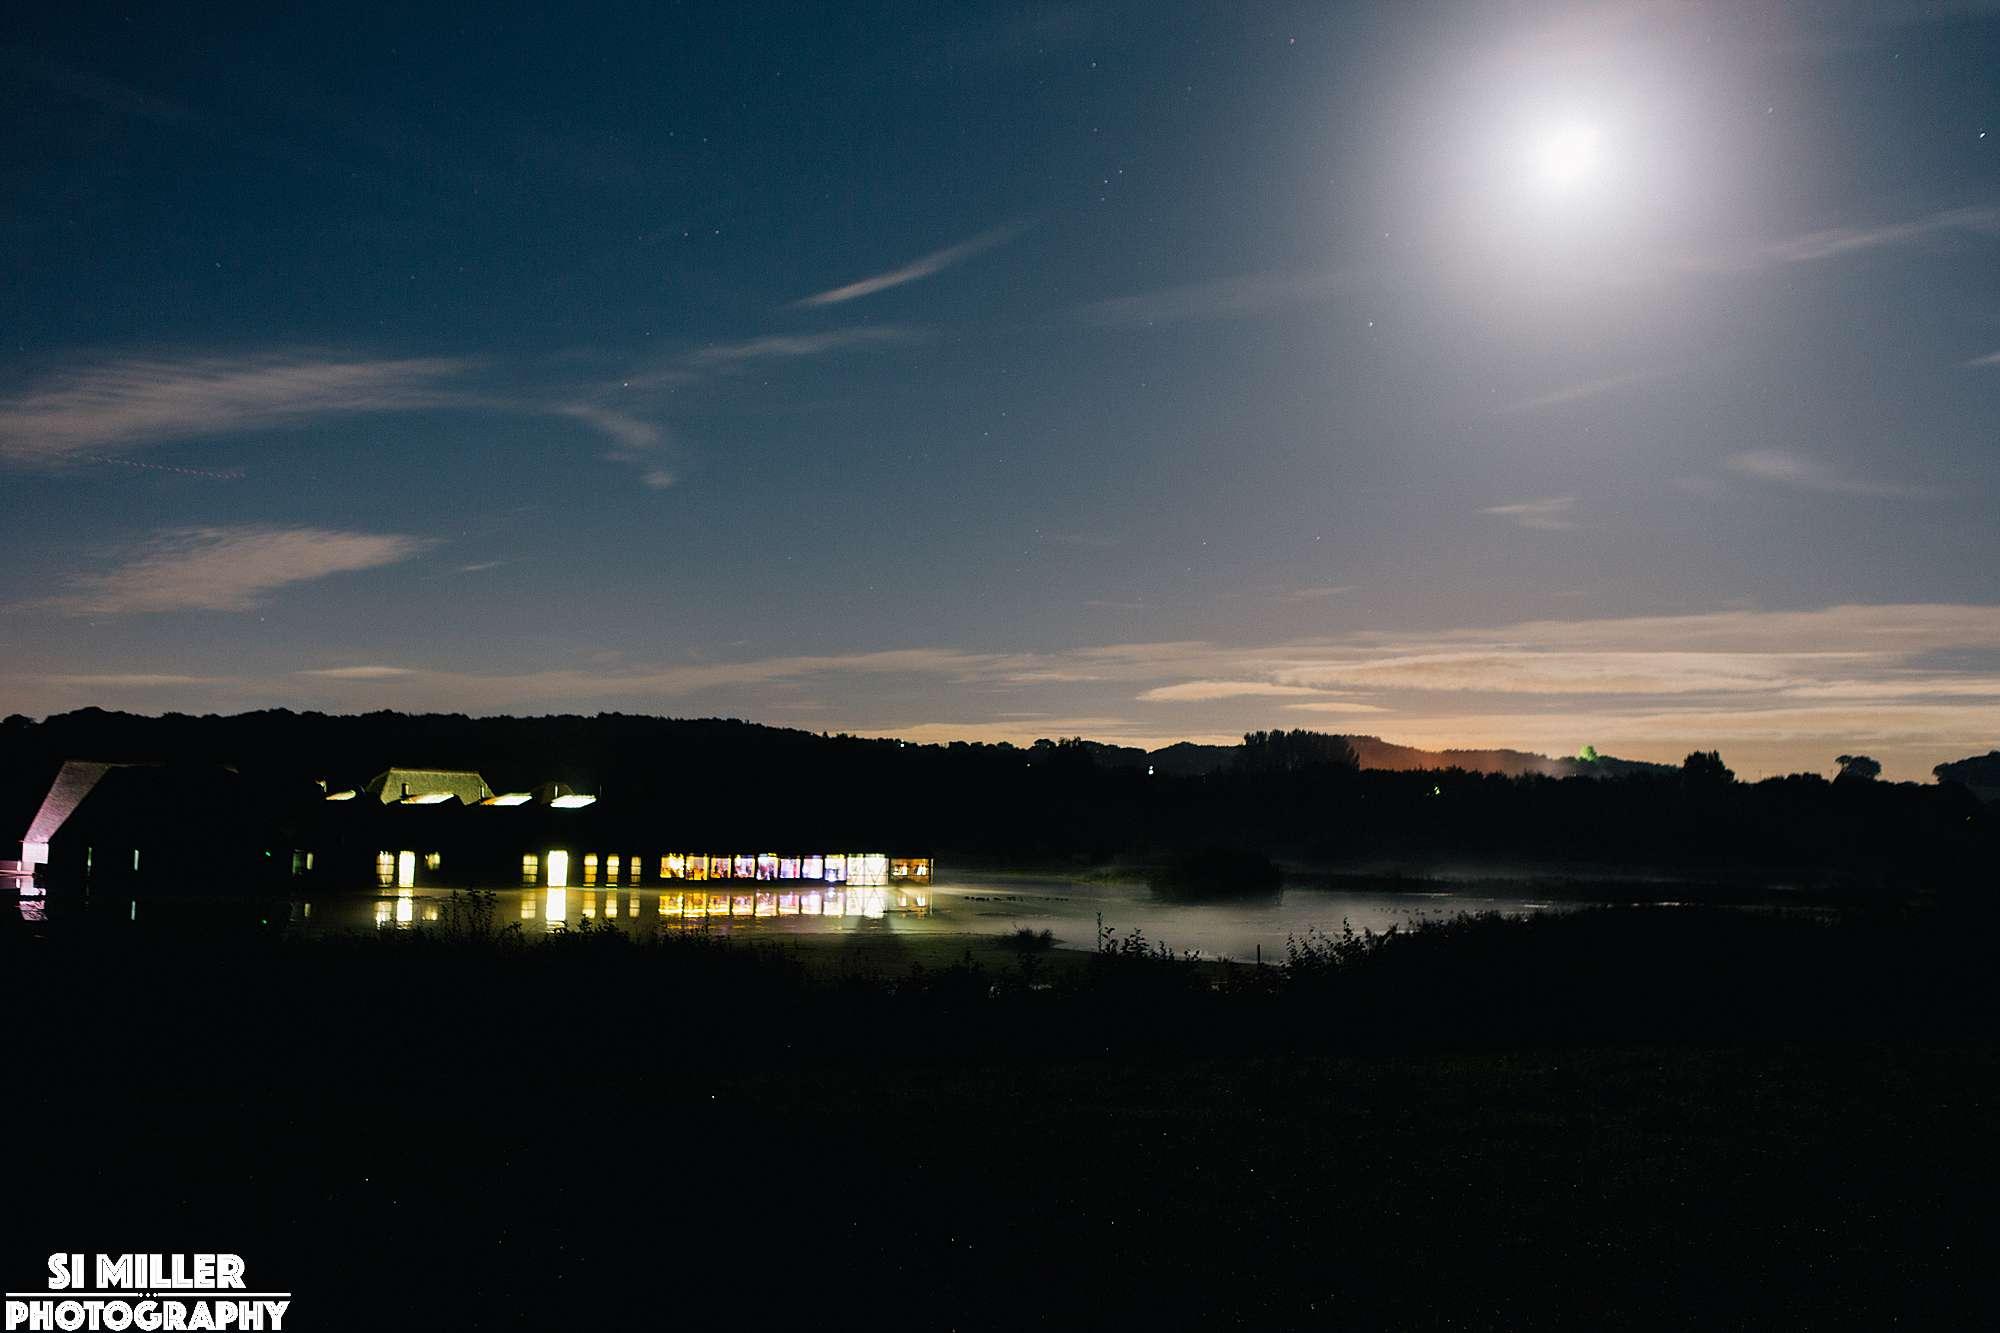 Brockholes vistor island at night light by the moon